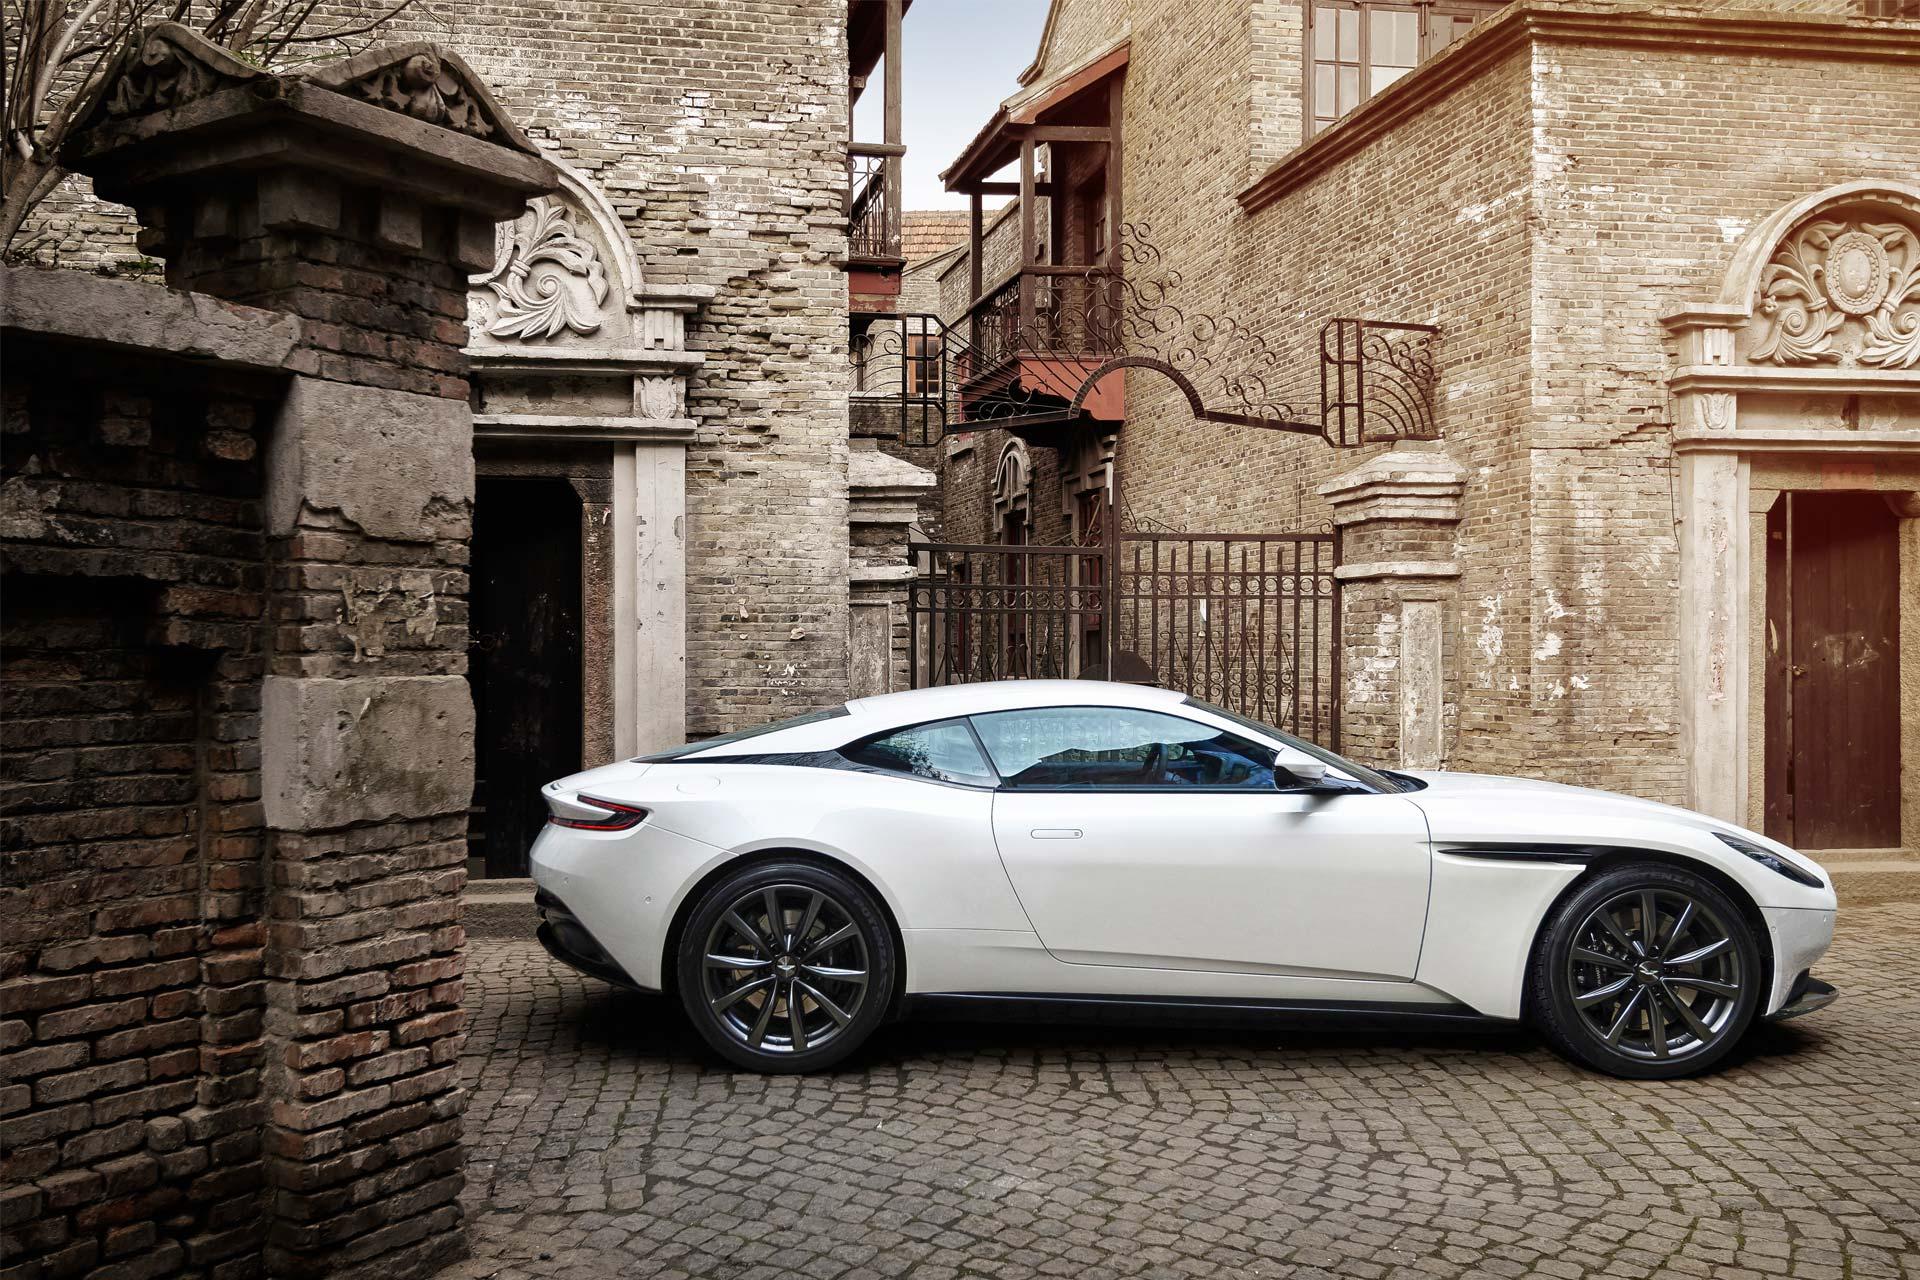 Aston-Martin-DB11-4.0-V8-2